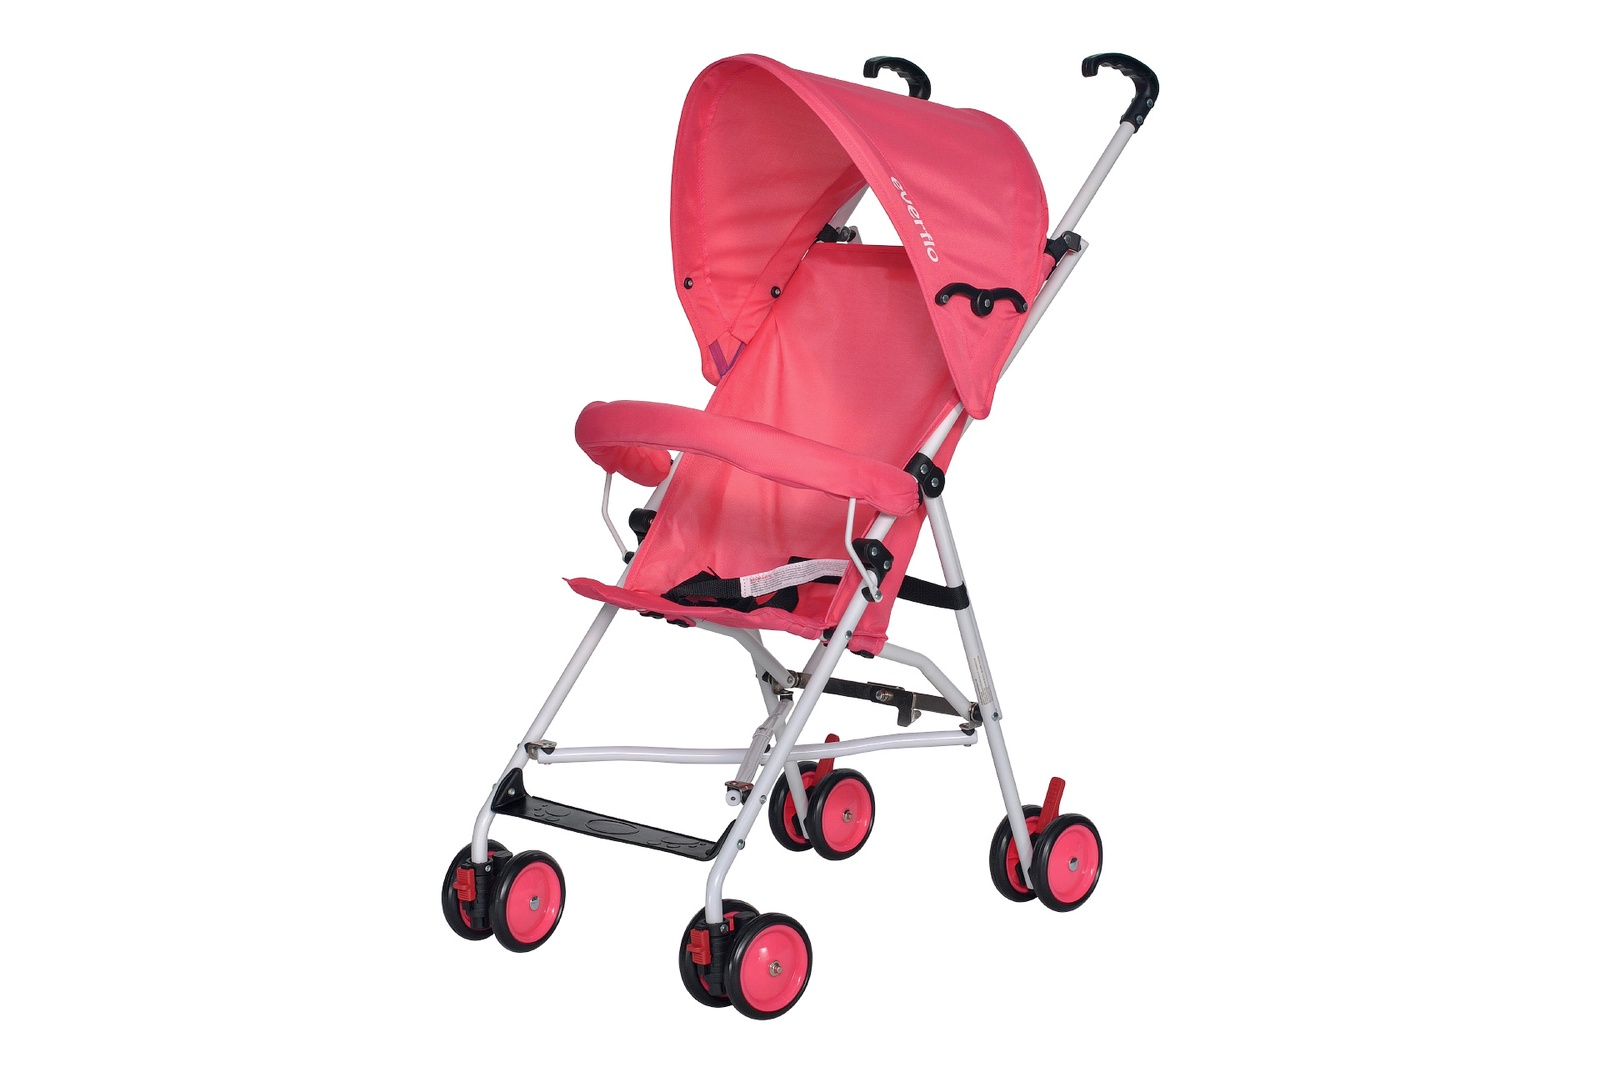 Коляска прогулочная Everflo Simple pink Е 100 розовый коляска трость cybex topaz princess pink 2016 516203015